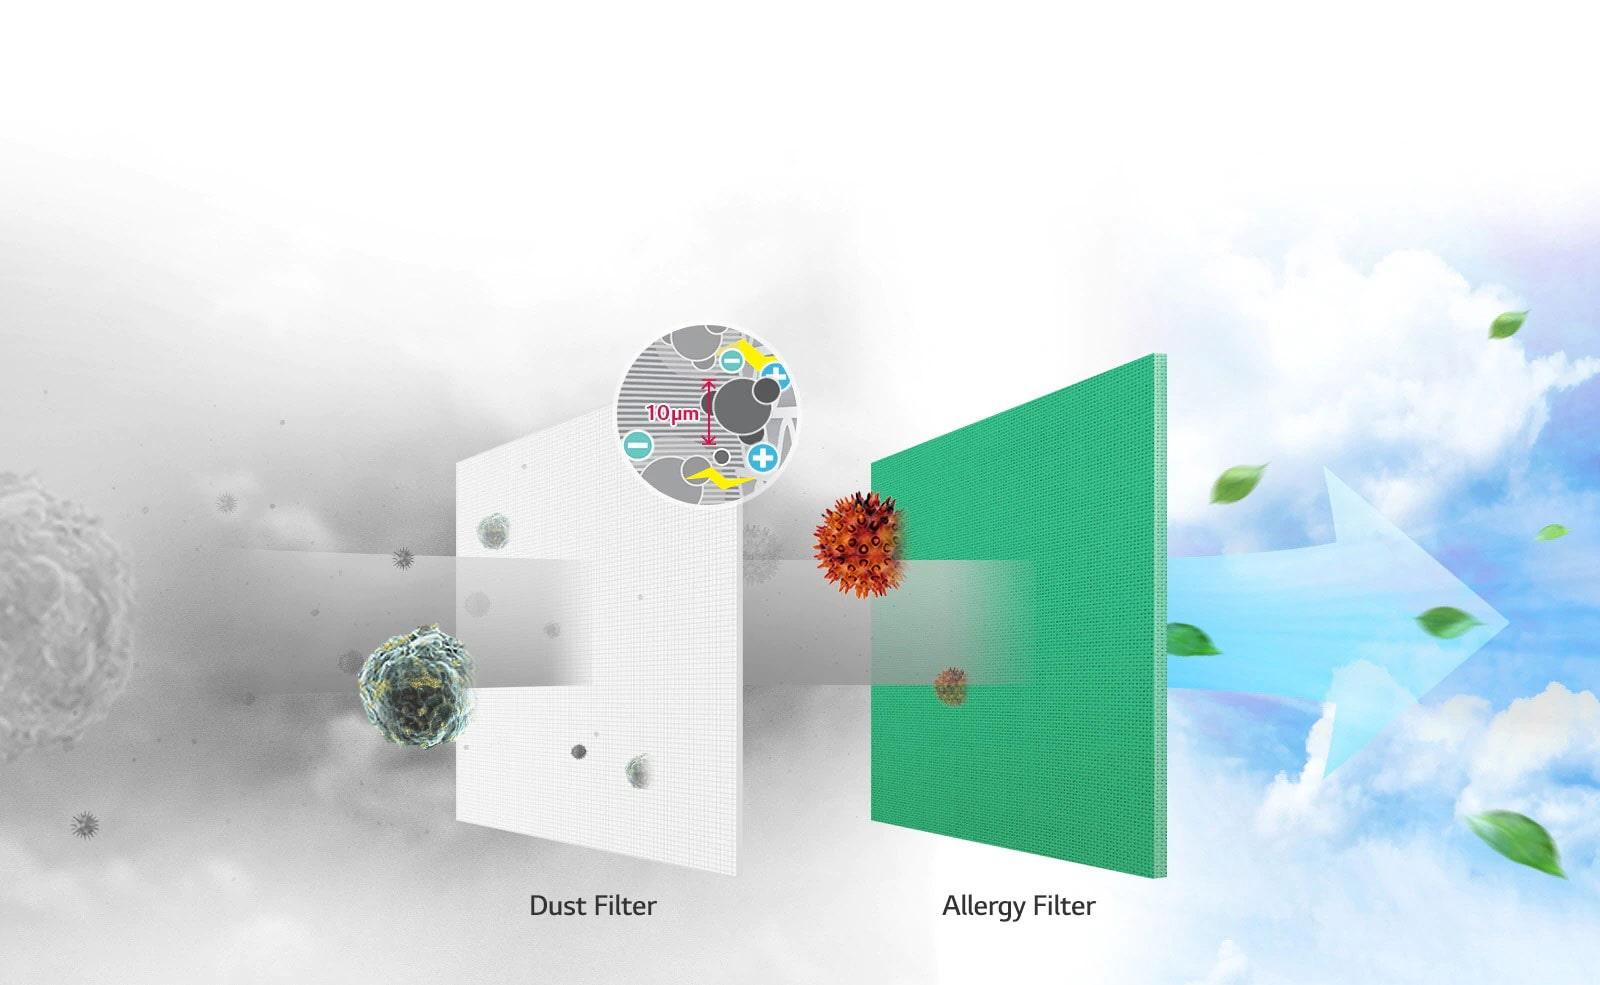 LG MS-Q18FNZD Anti Allergy Filter